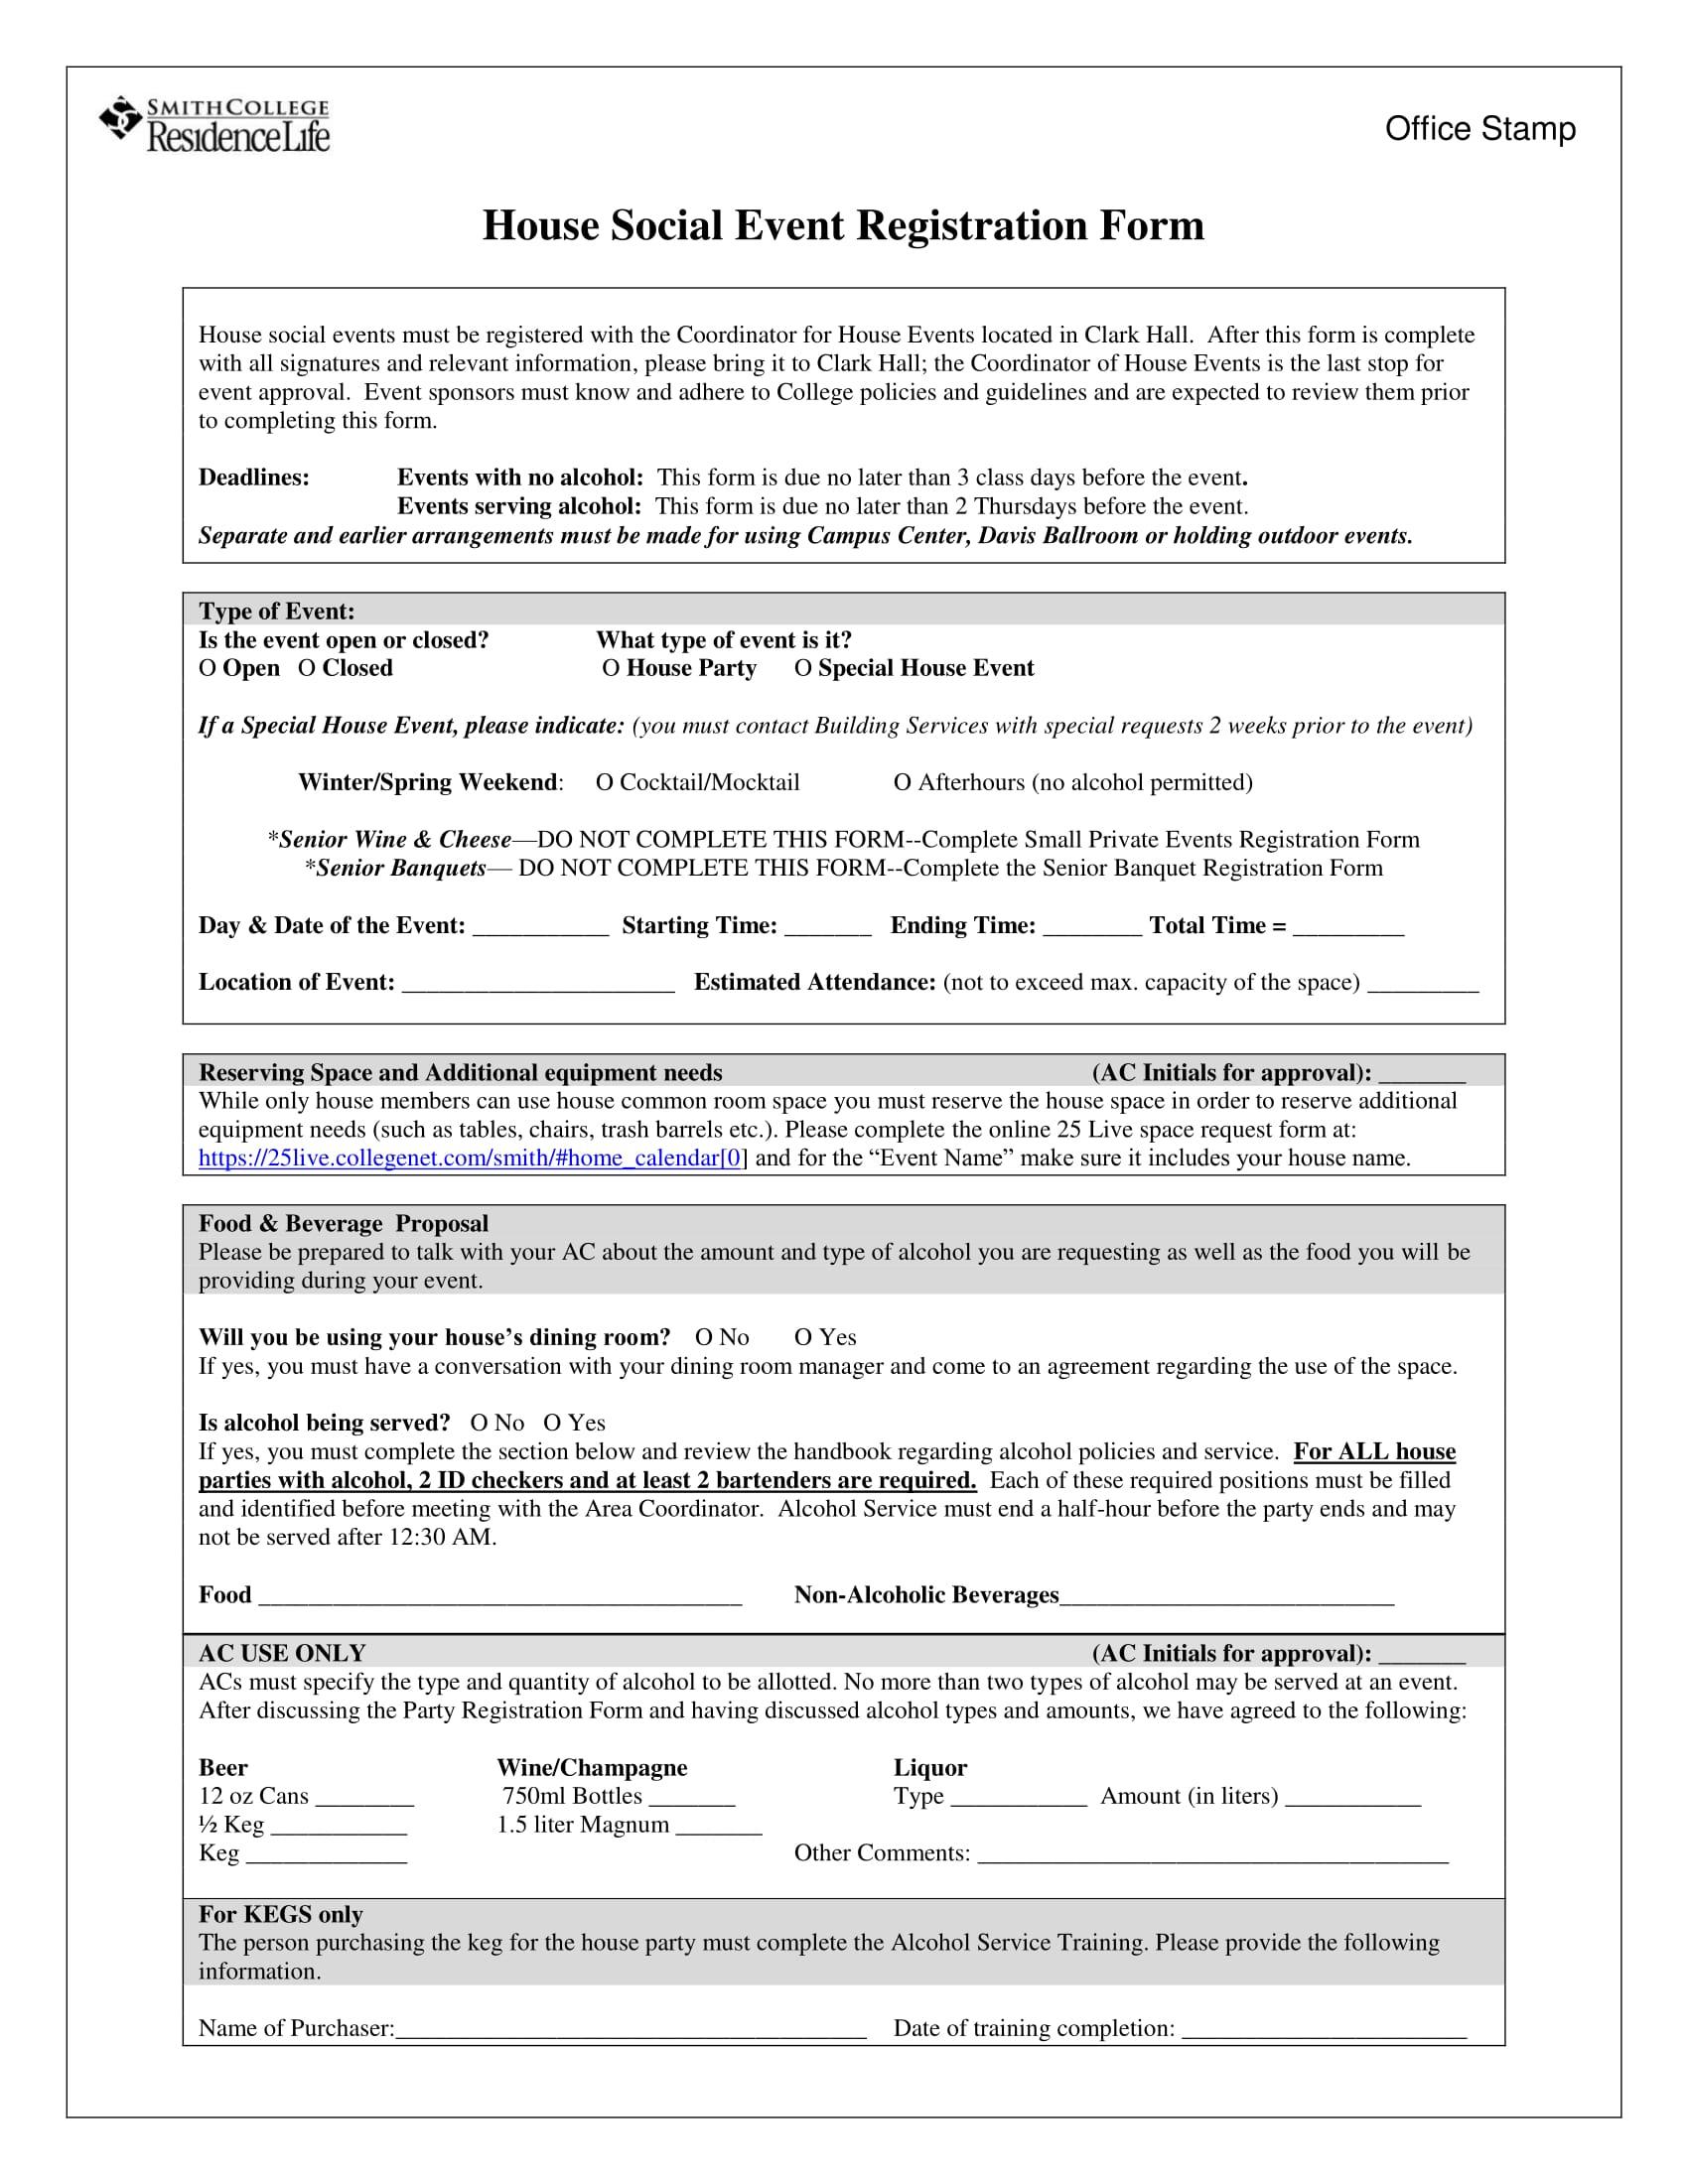 house social event registration form 2